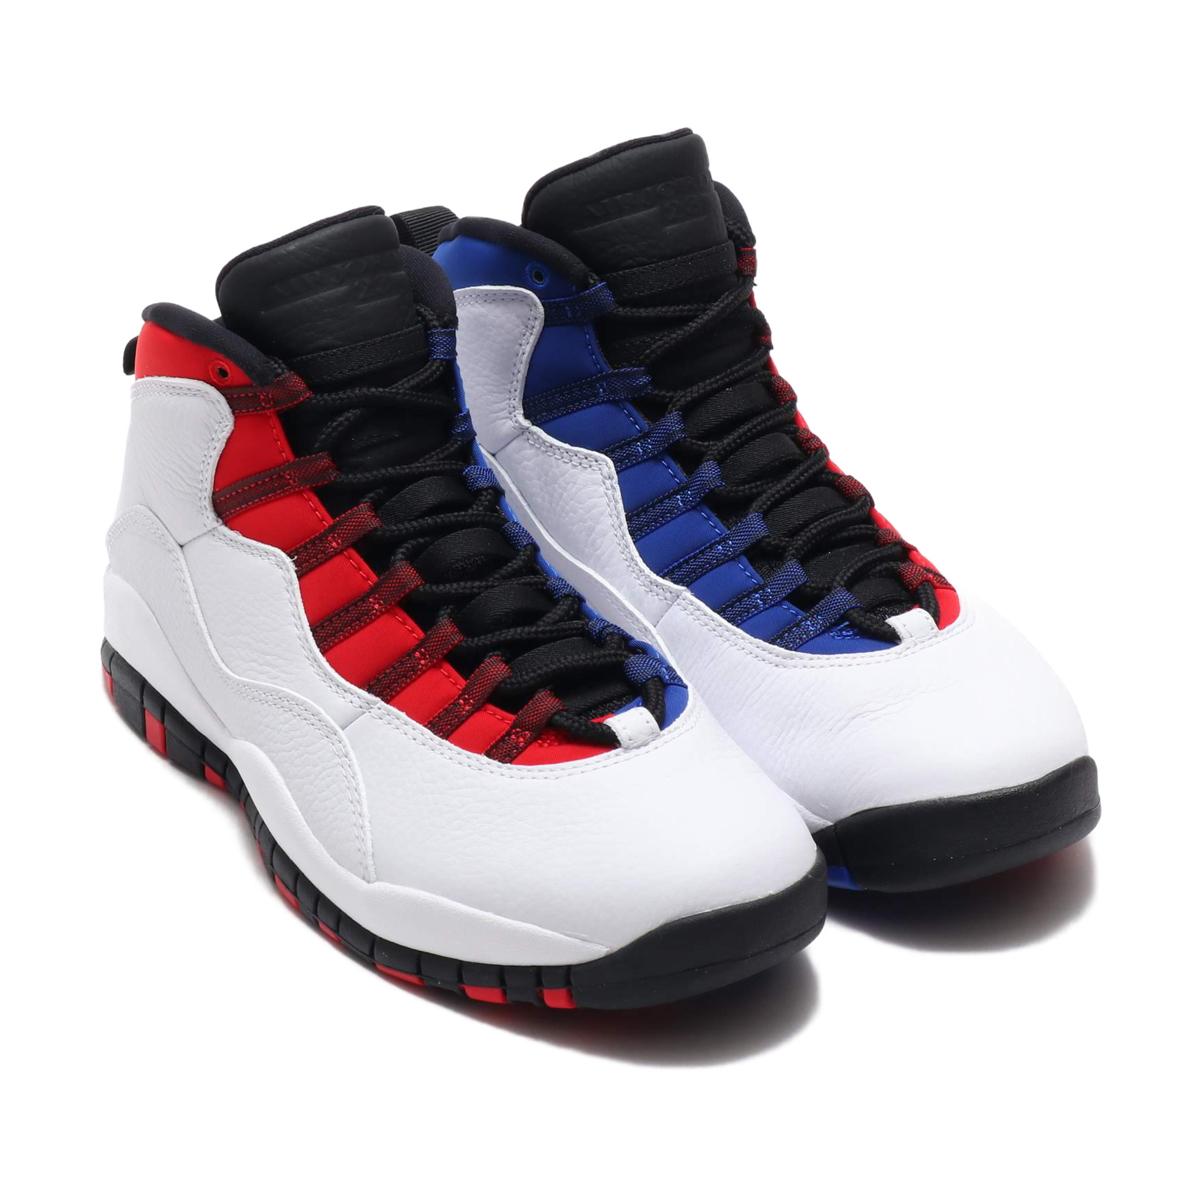 jordan 10 red and blue